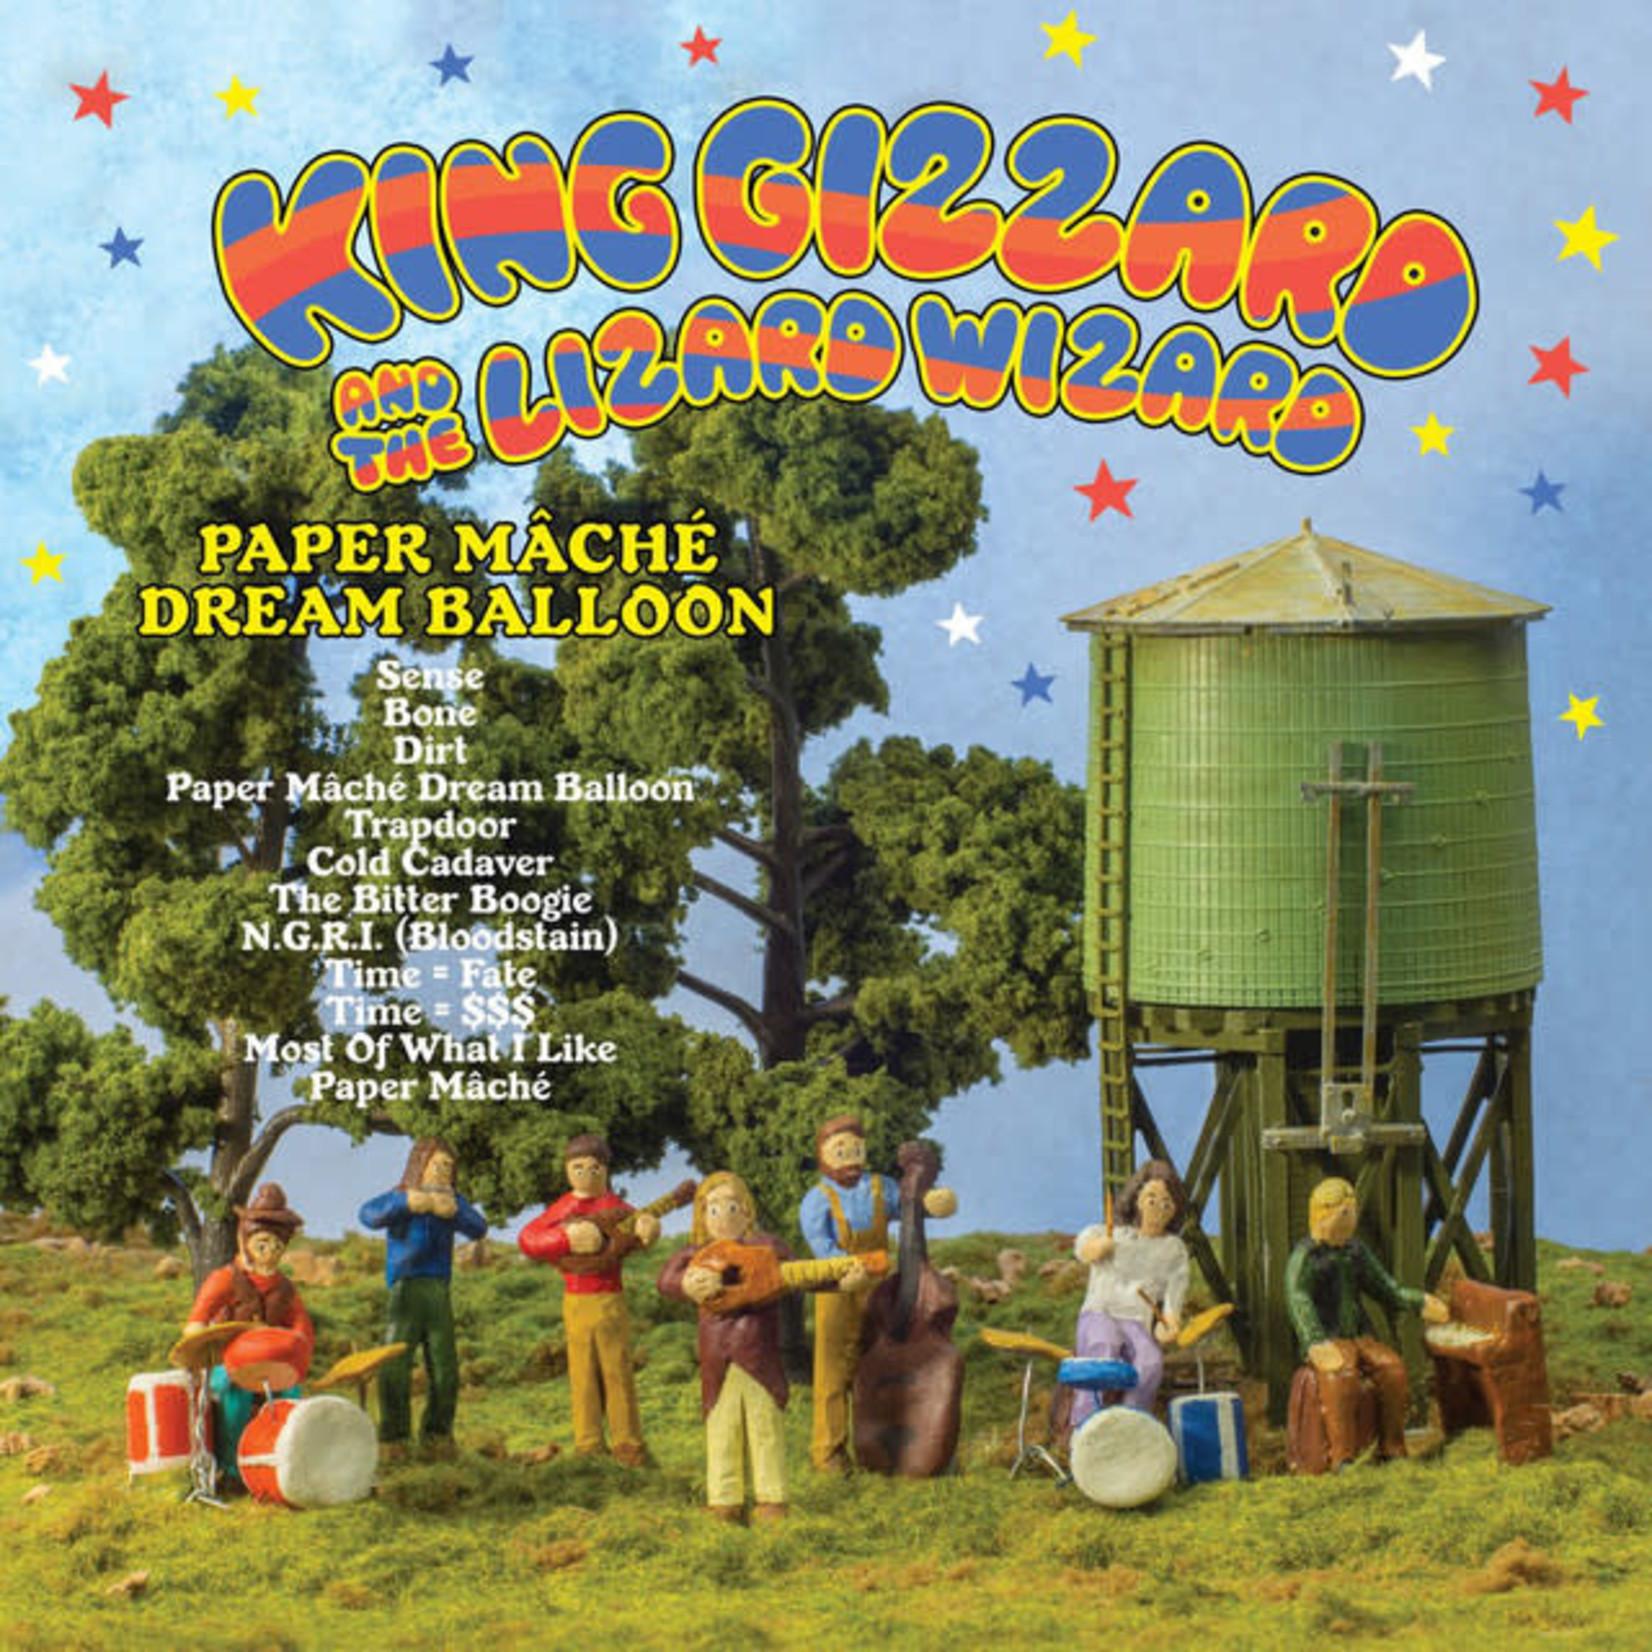 Vinyl King Gizzard - Paper Mache Dream Balloon